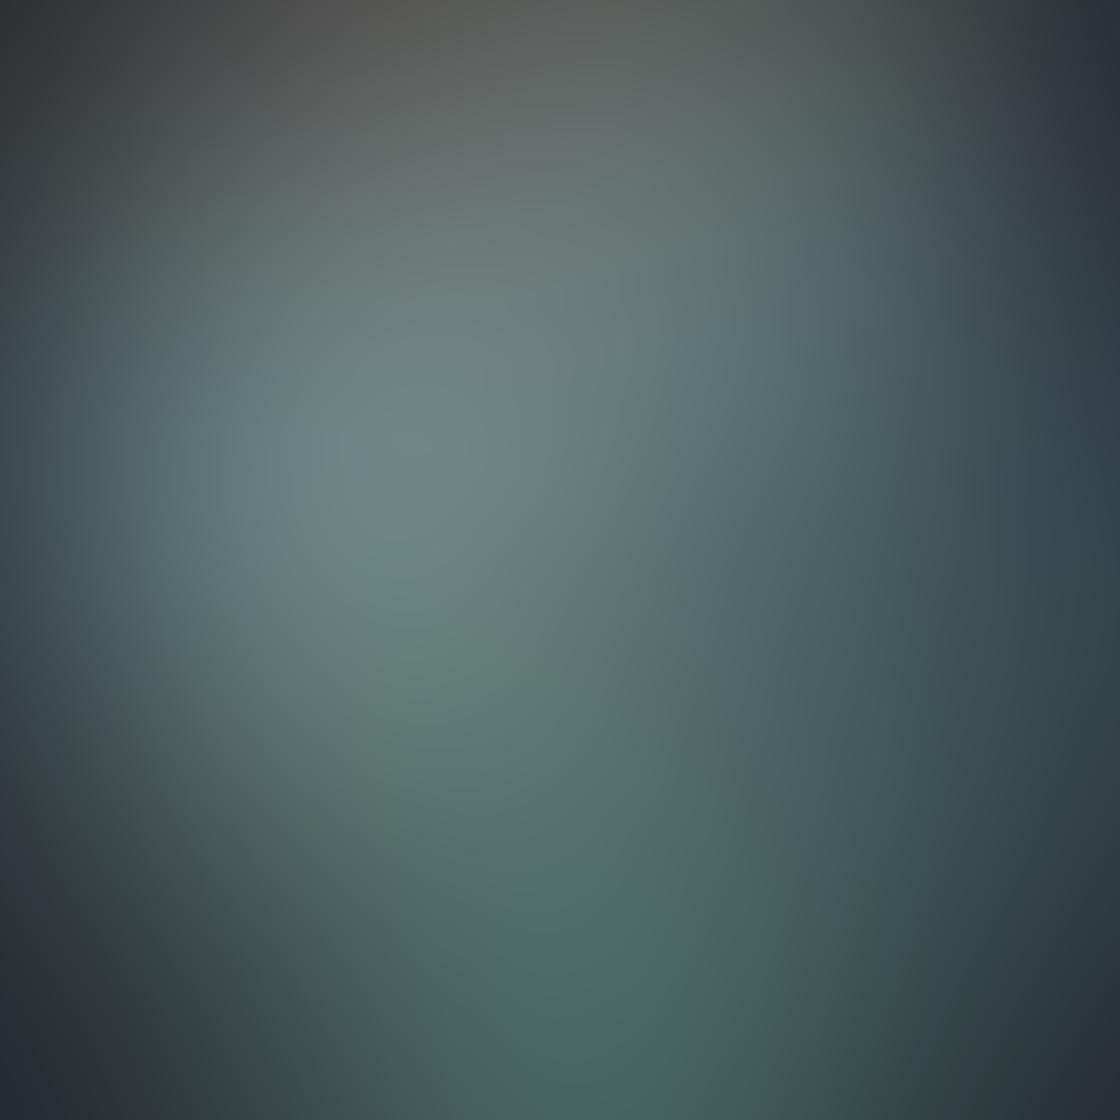 iPhone Reflection Photo 04